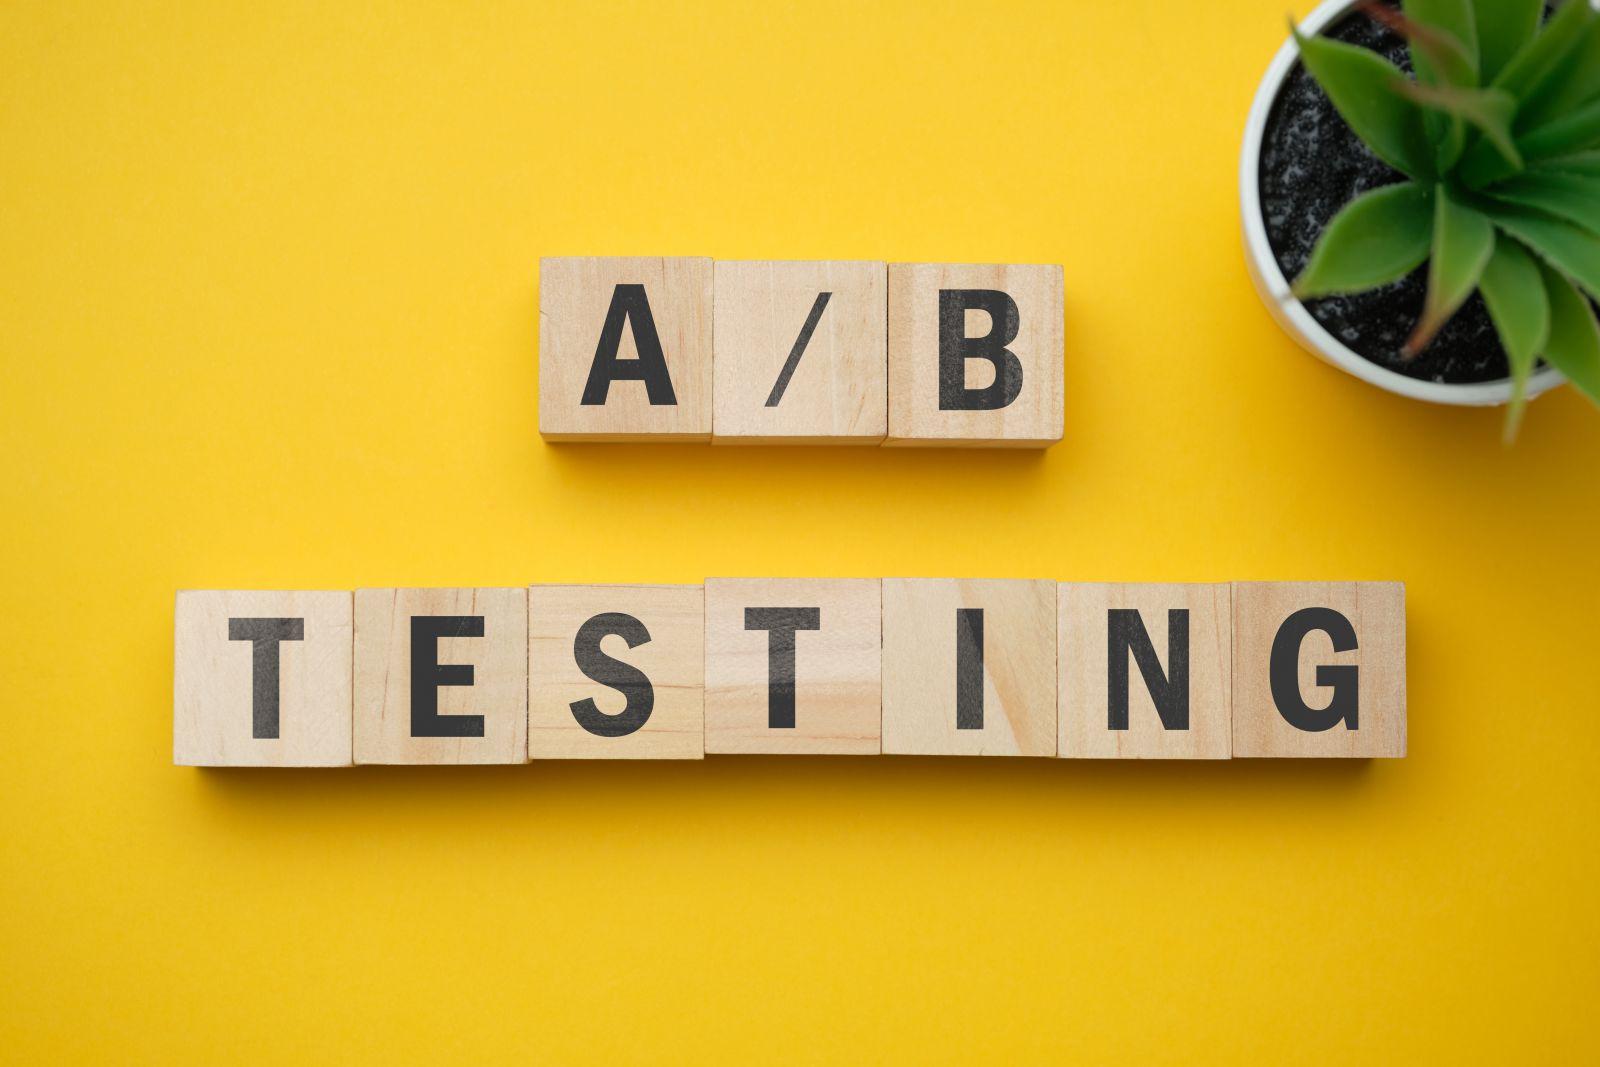 a b teste